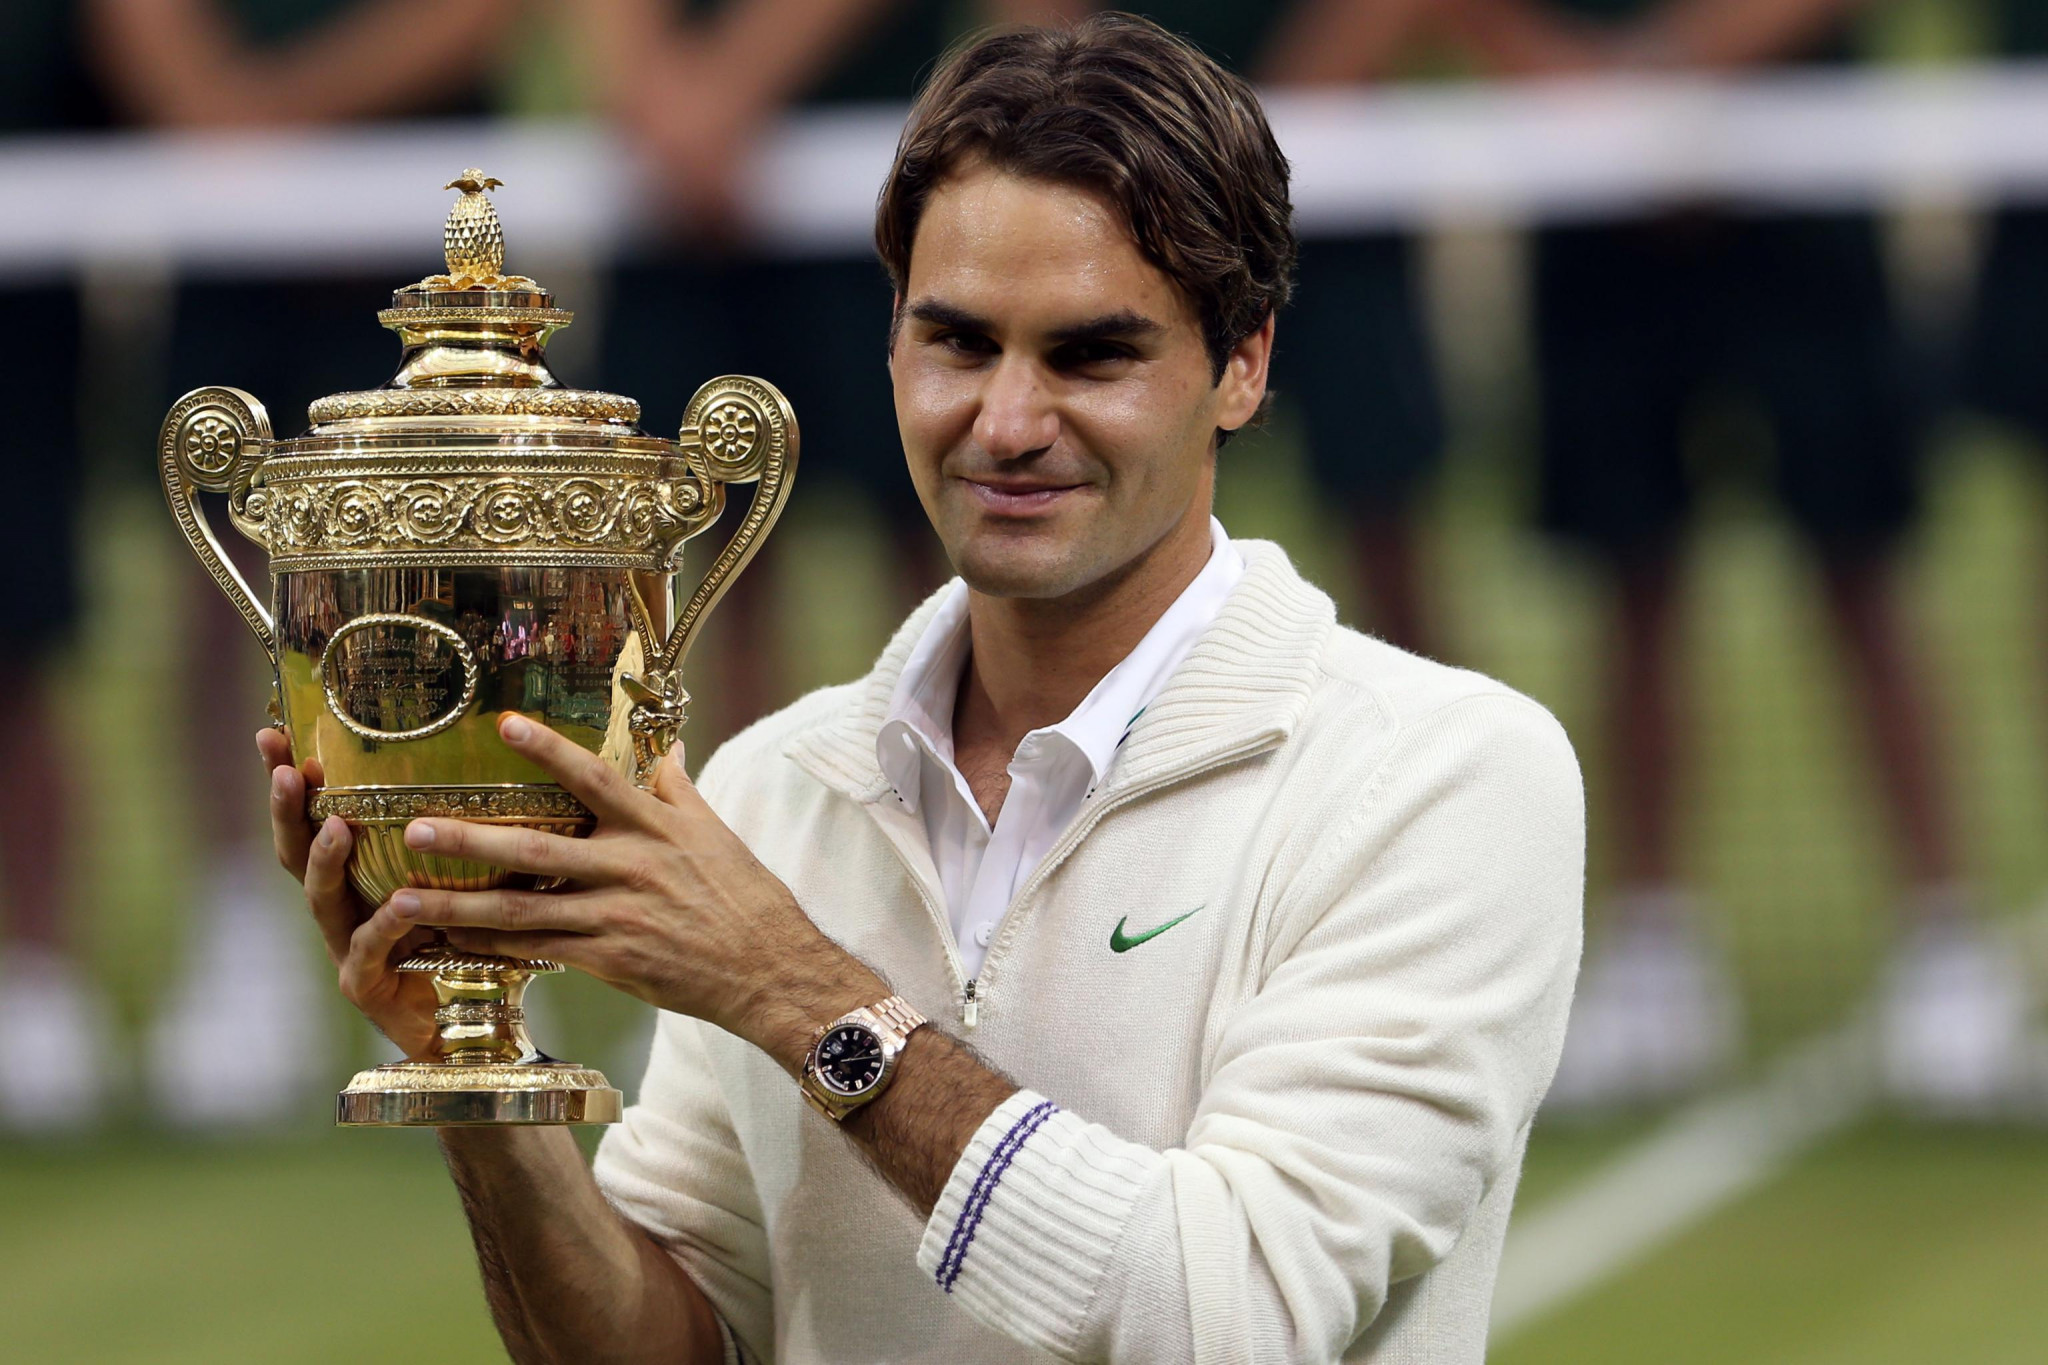 Federer memorabilia auction expected to raise over £1 million